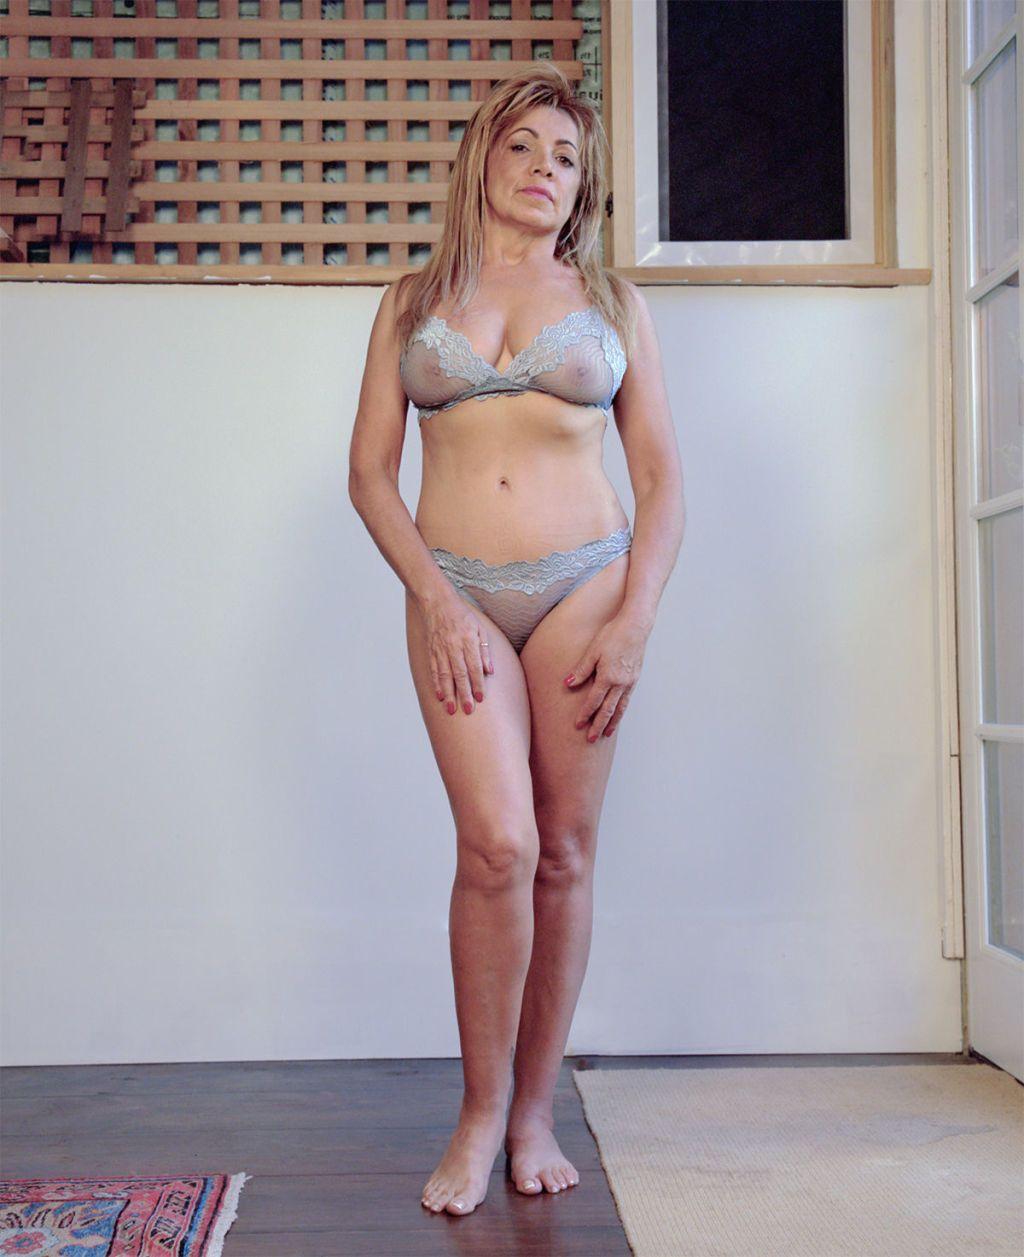 Women in lingerie pics